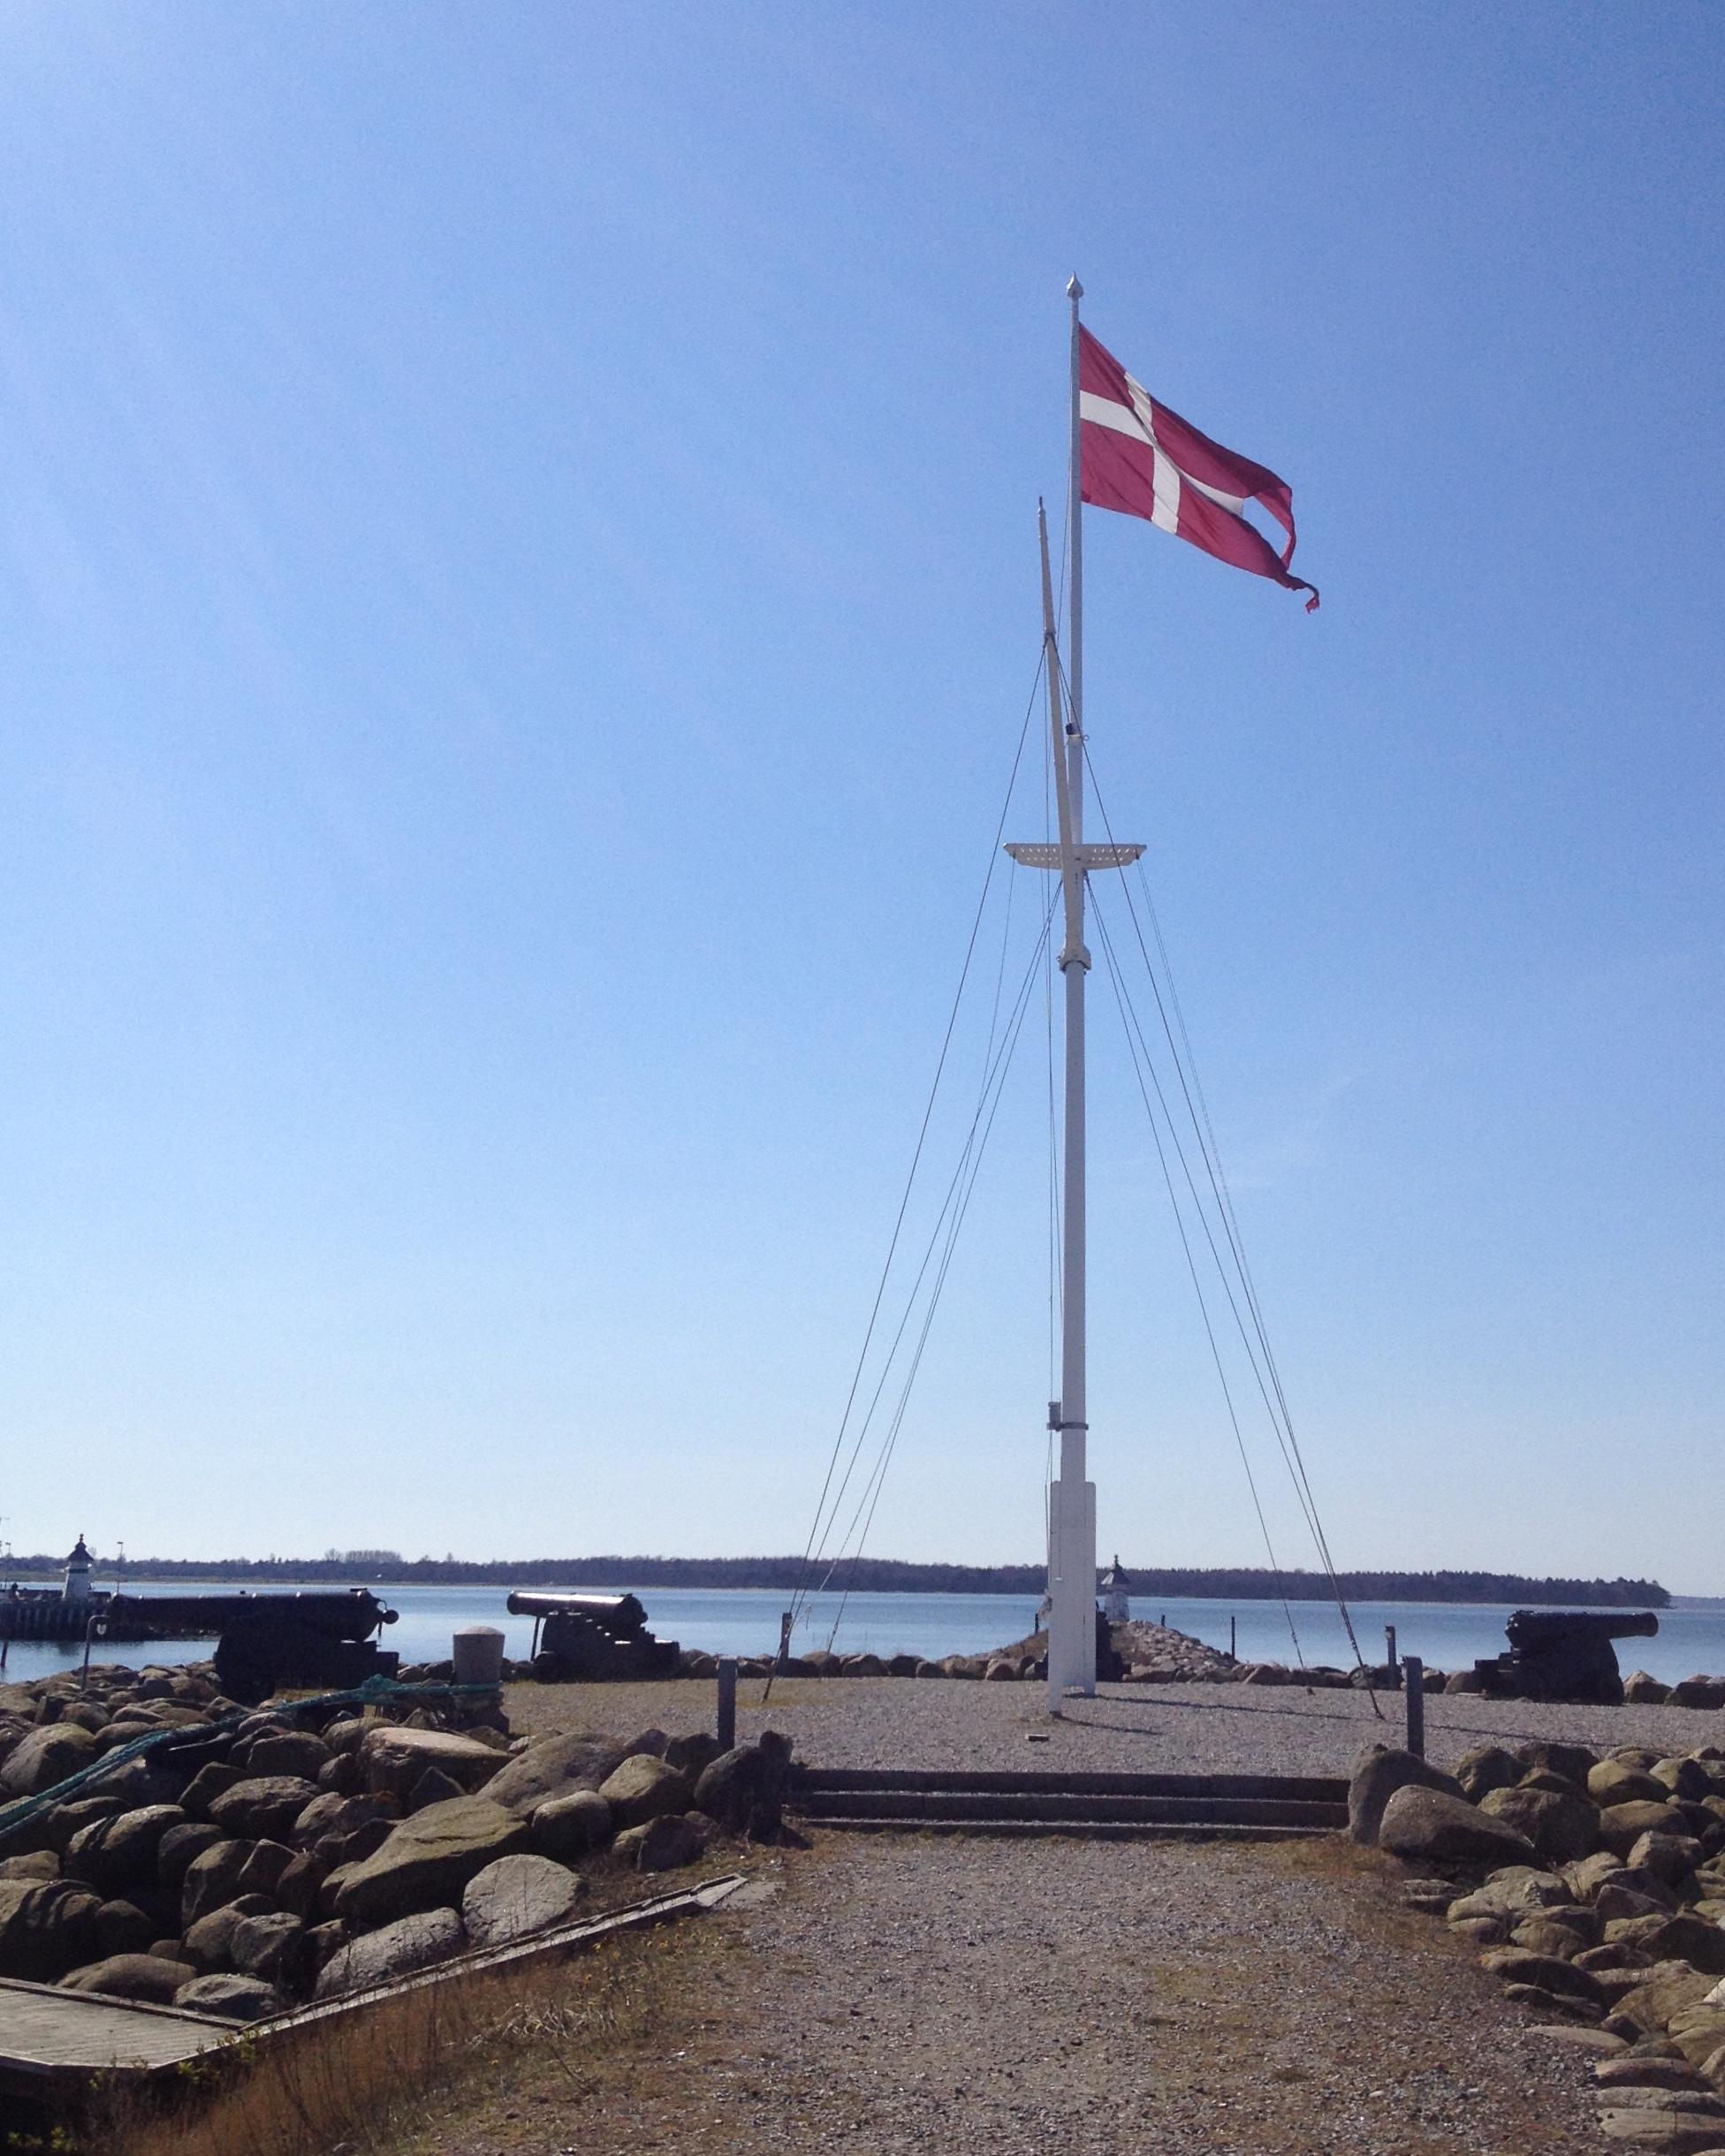 Dänemark, April 2015